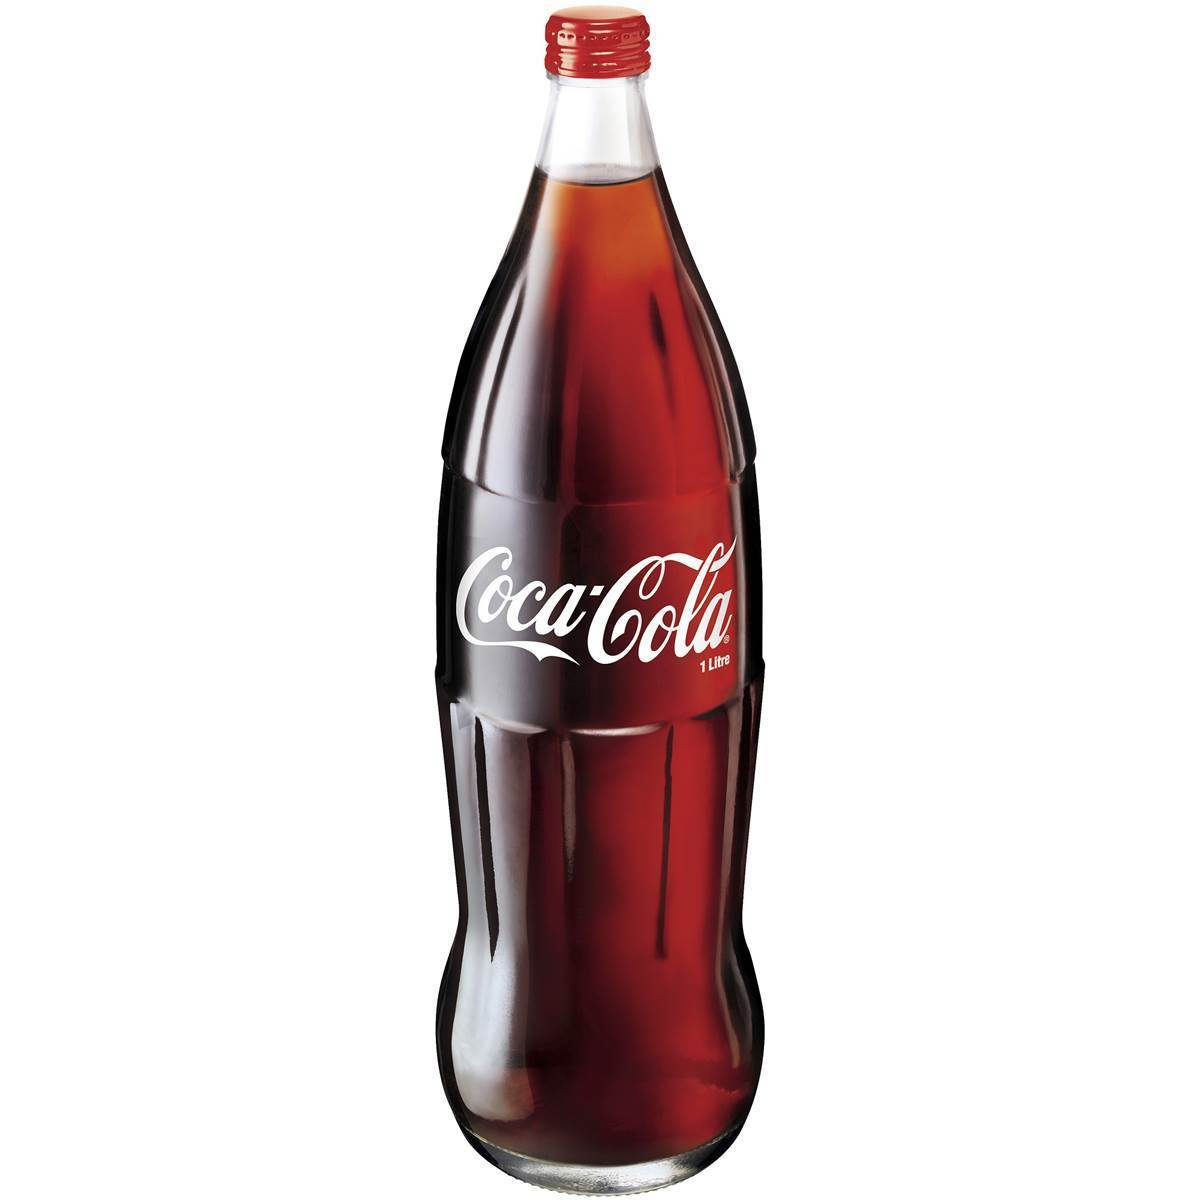 COCA-COLA 6x1l (verre)